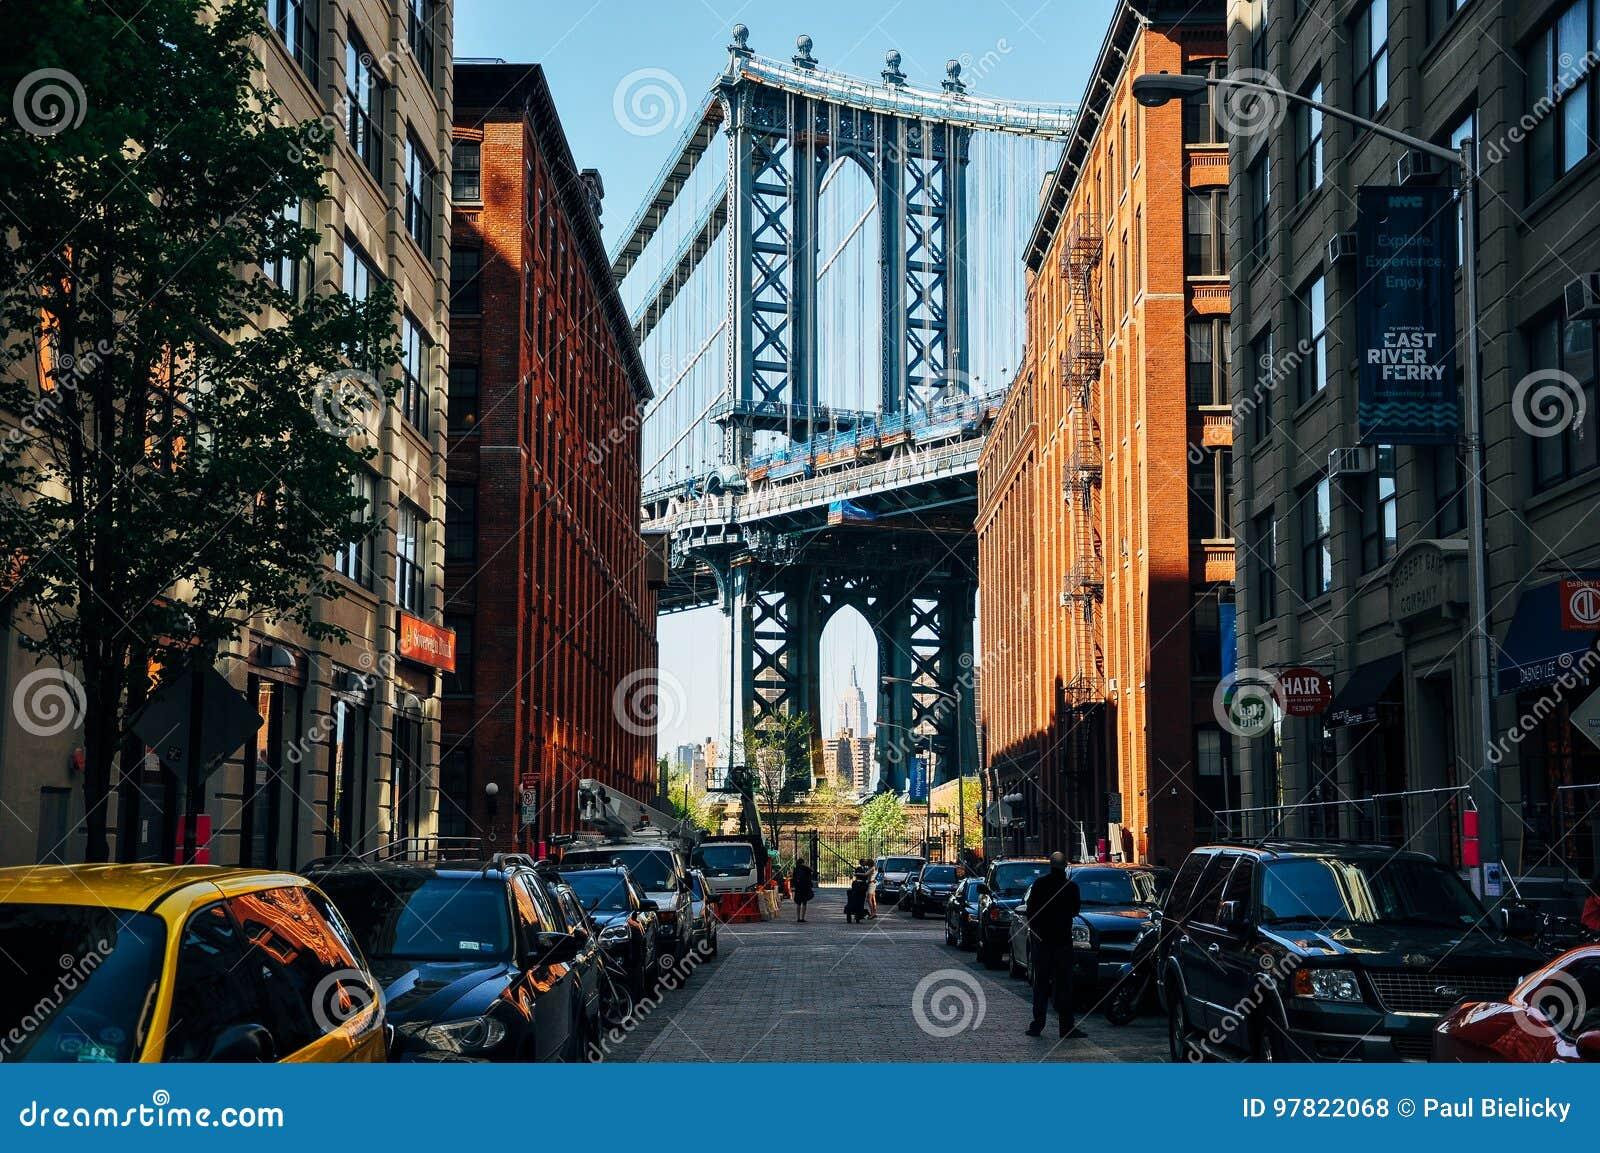 A view of Manhattan bridge from Dumbo.